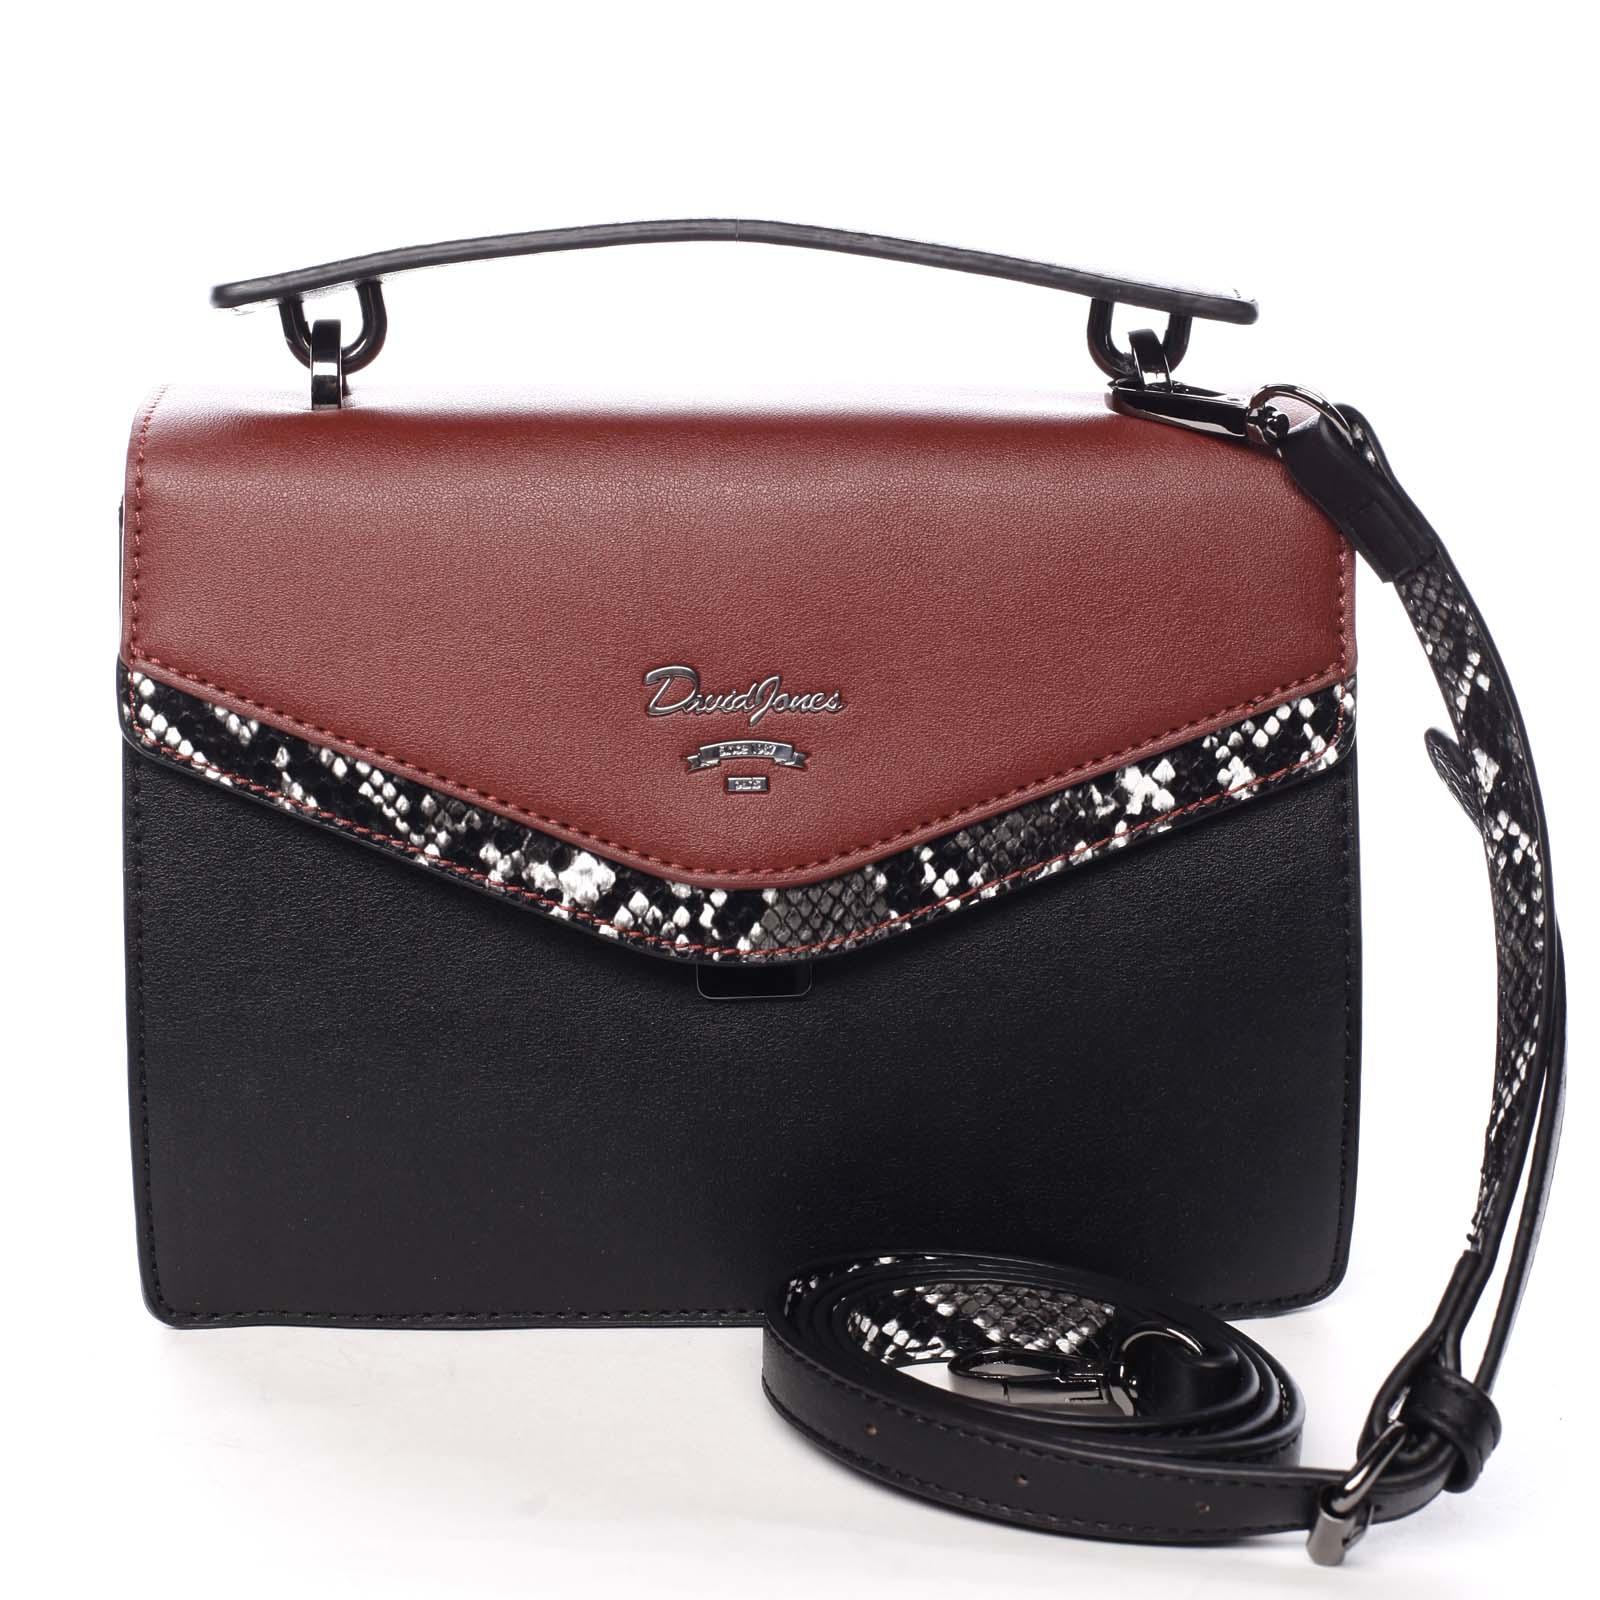 Dámská kabelka do ruky černo červená - David Jones Scarlett